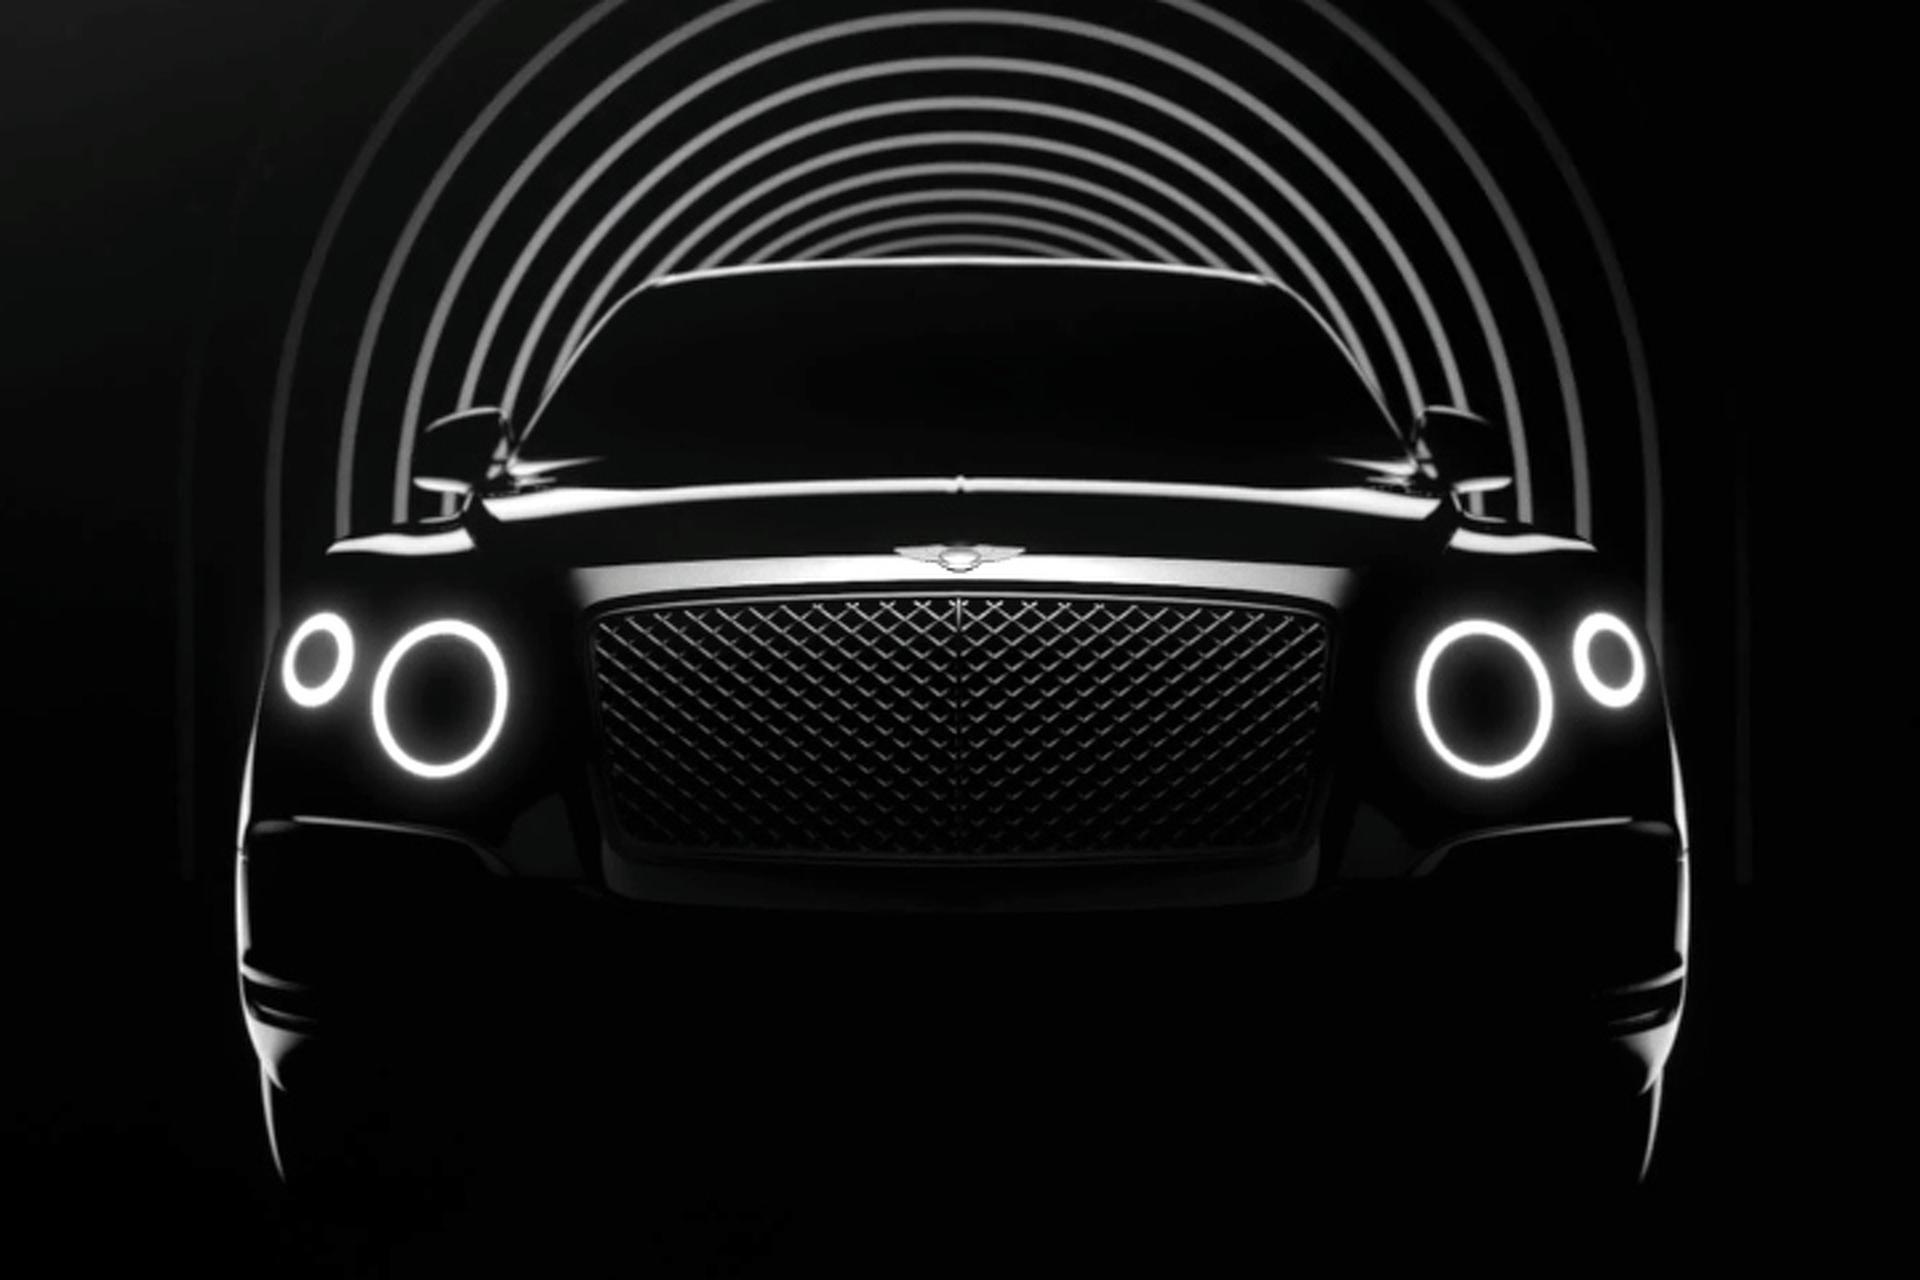 Bentley Teases Forthcoming SUV, Confirms Plug-In Hybrid Option